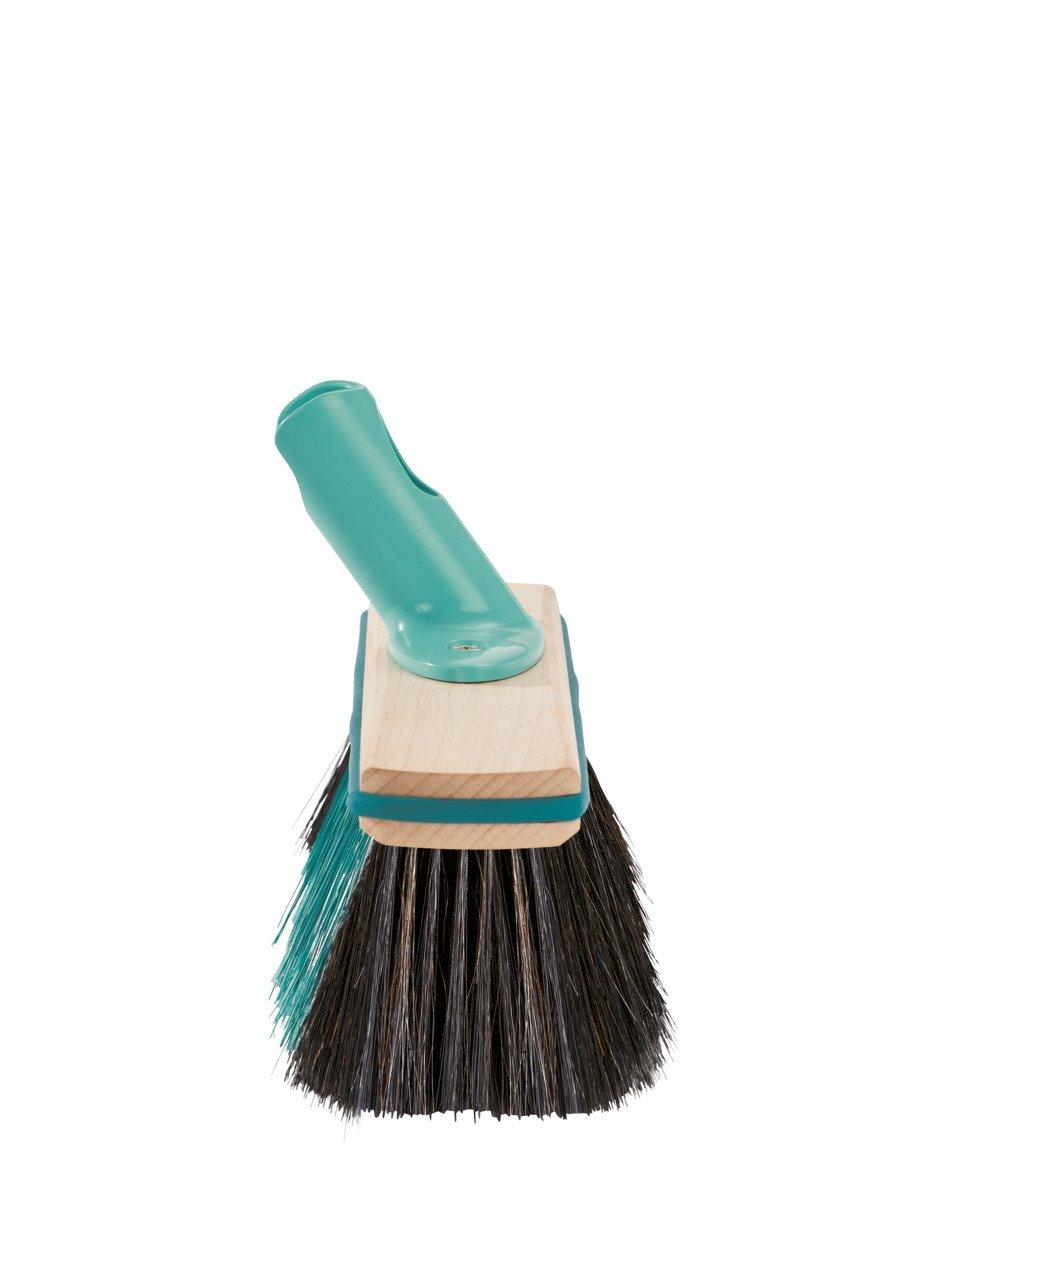 Leifheit Hard Floor Broom Xtra Clean Eco Plus 30 cm, Floor Broom, House Broom, Dustpan Brush, Wood / Mint Green, 45002 by Leifheit (Image #4)